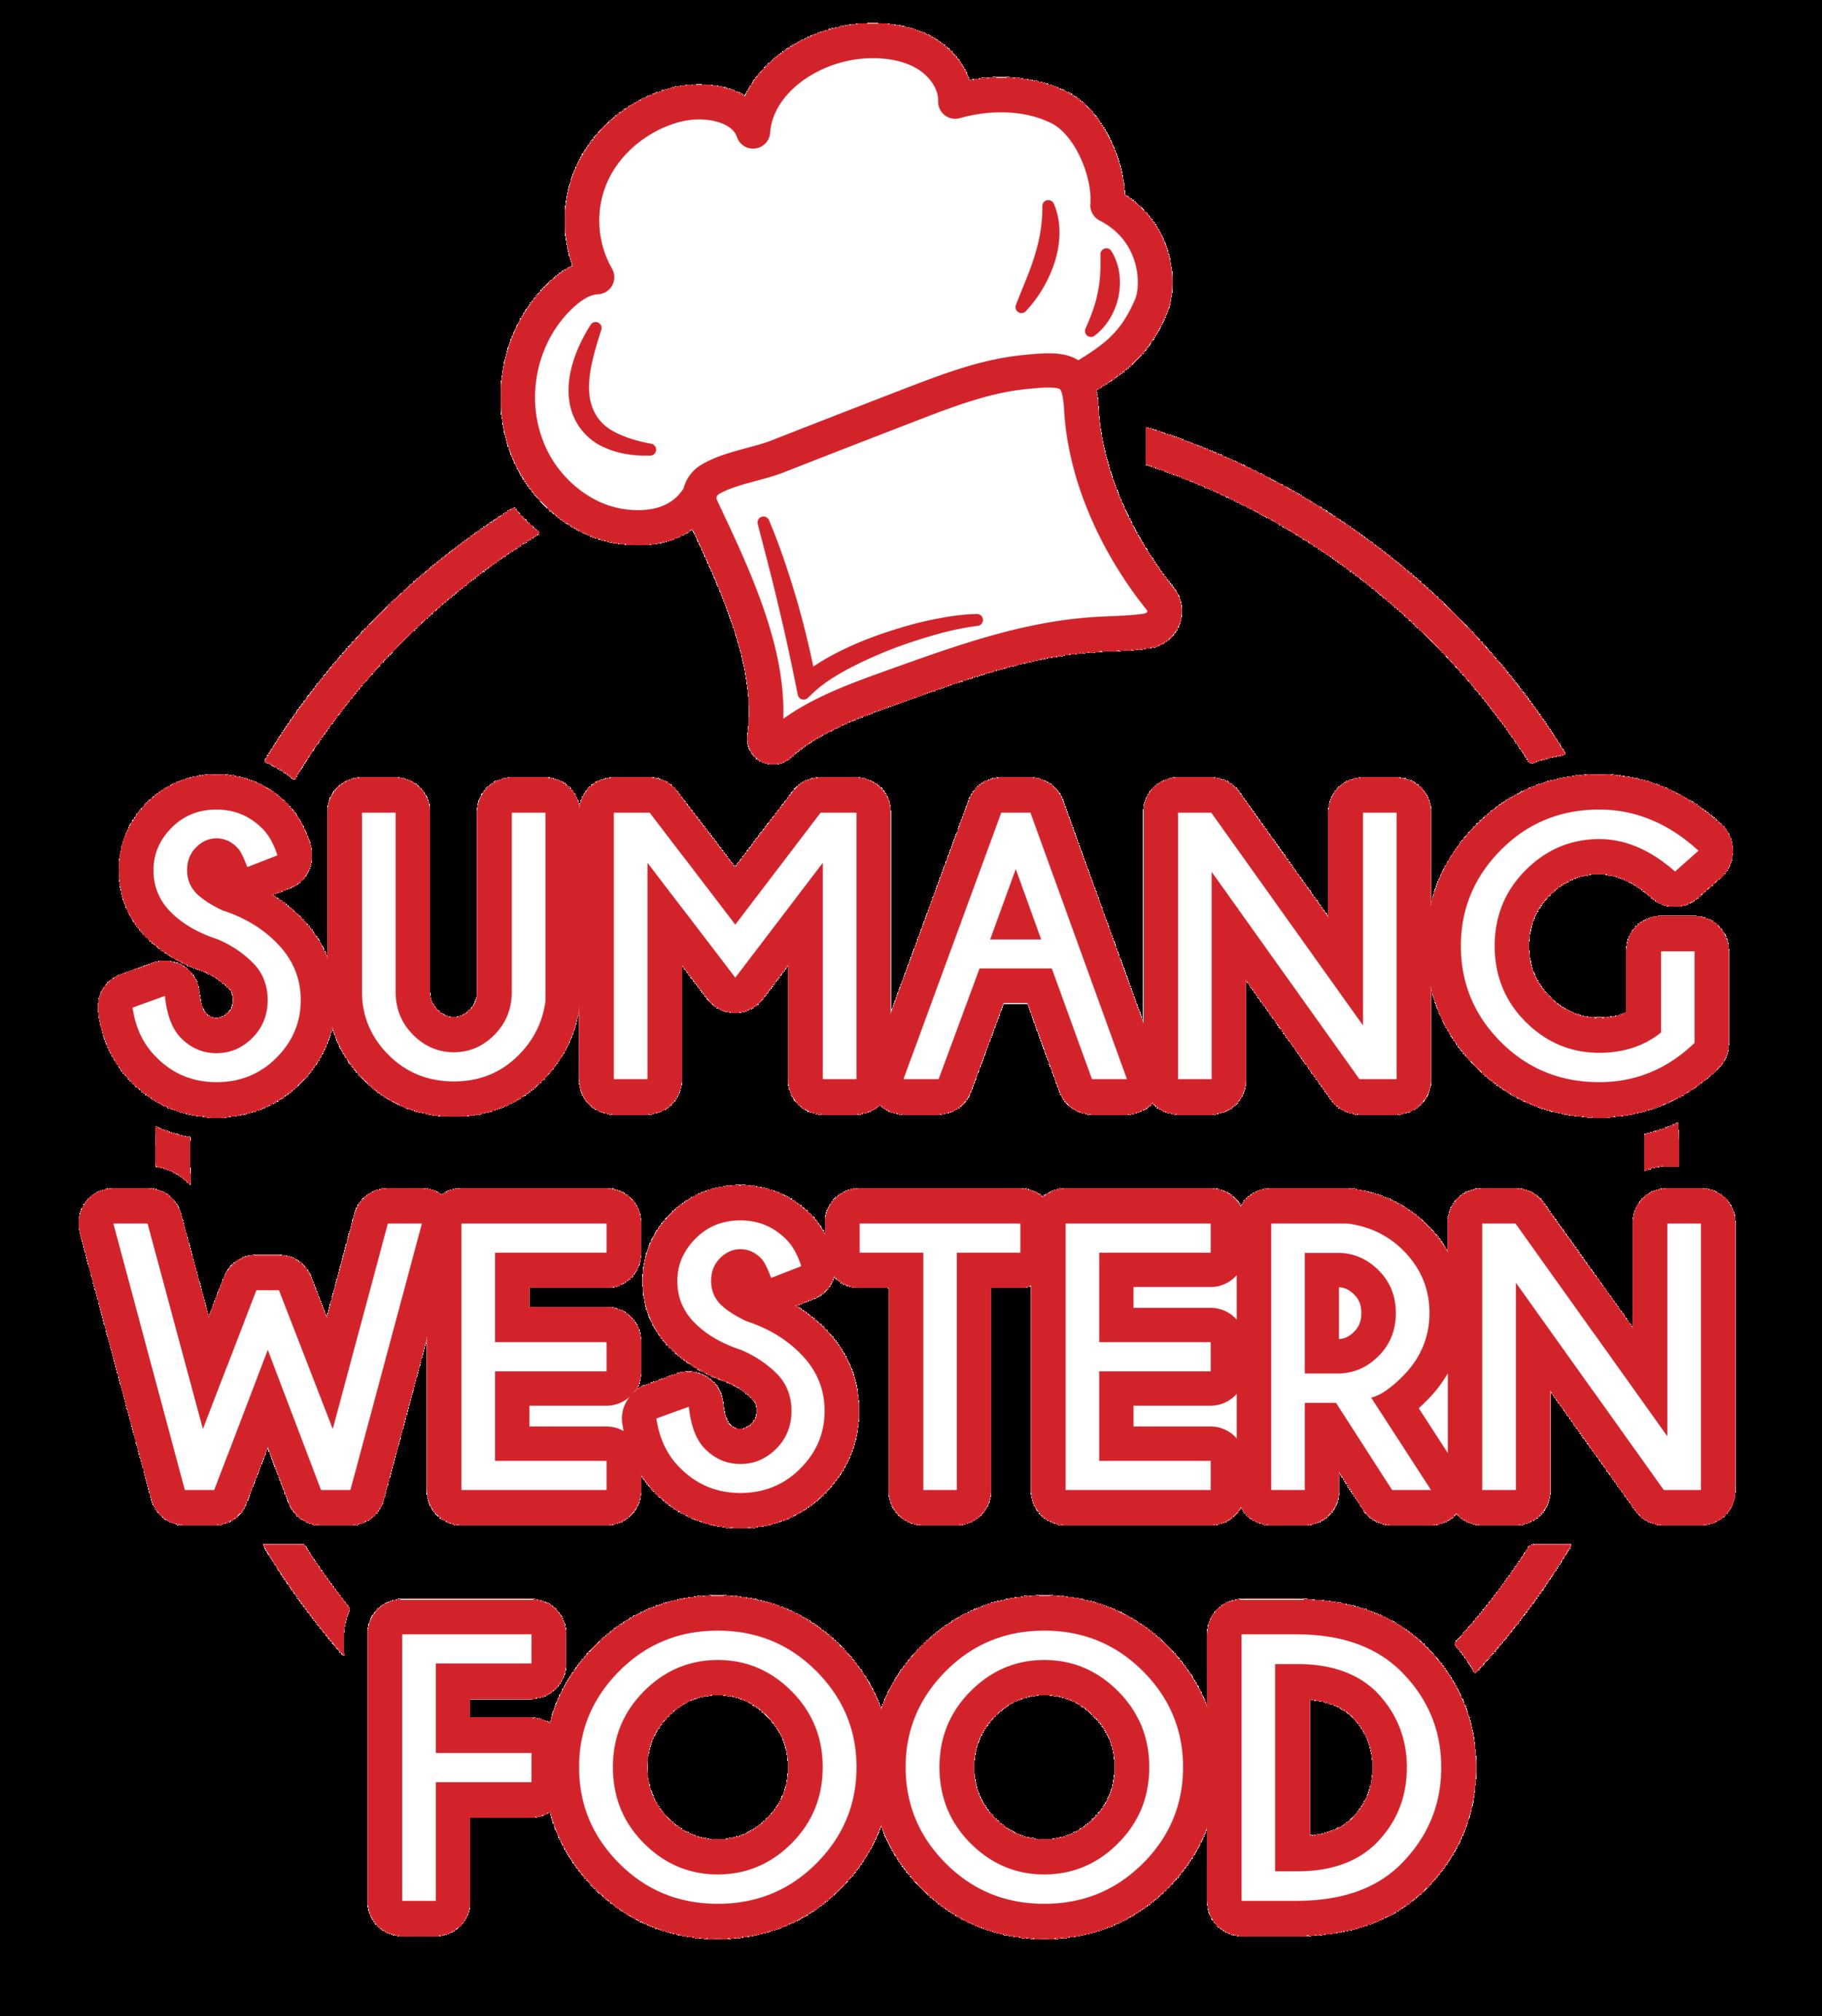 Sumang Western food.png